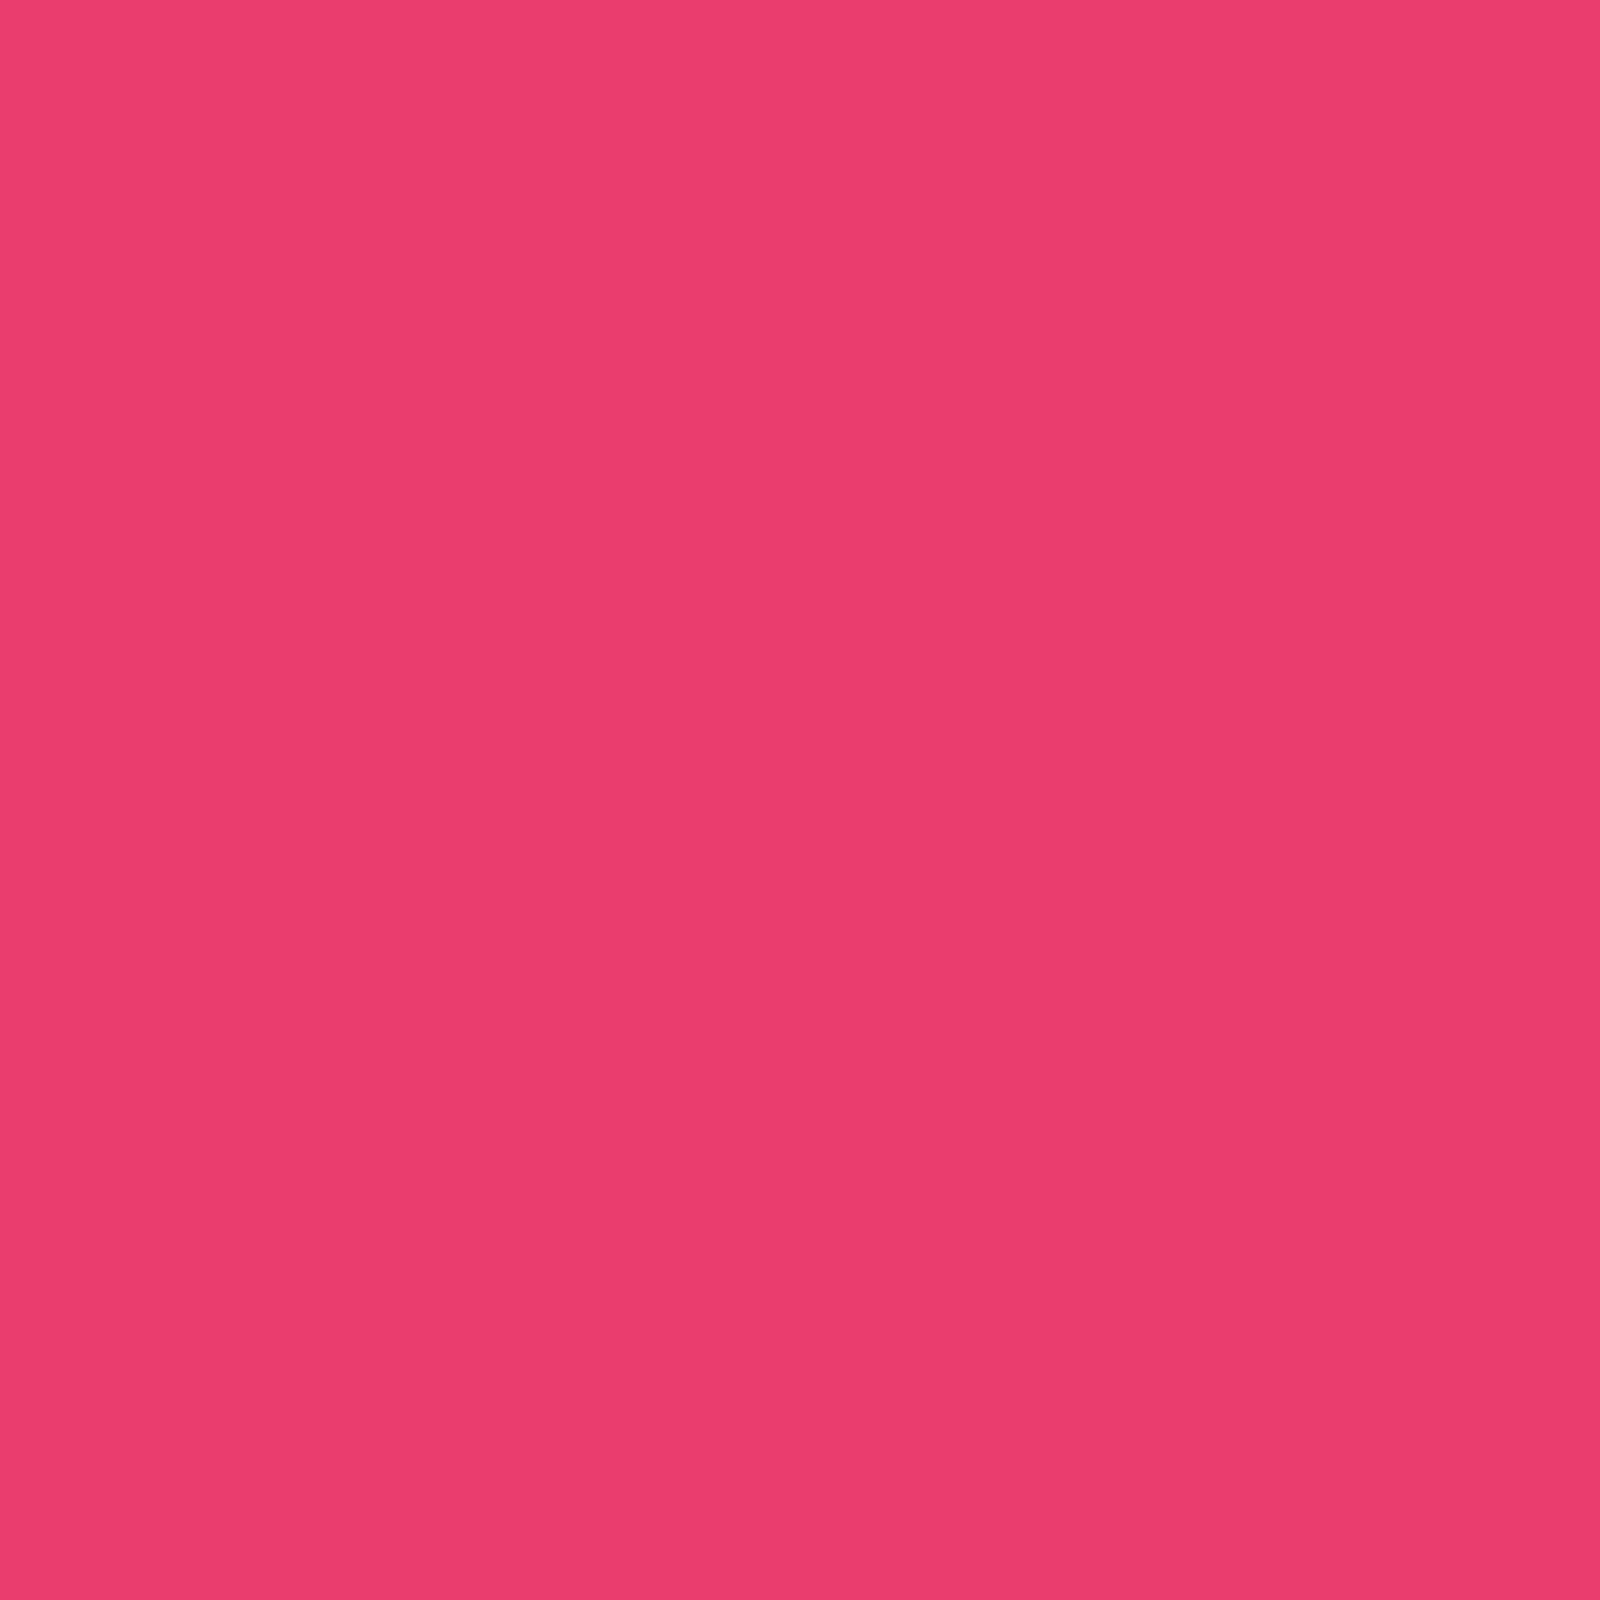 kobra pink neon